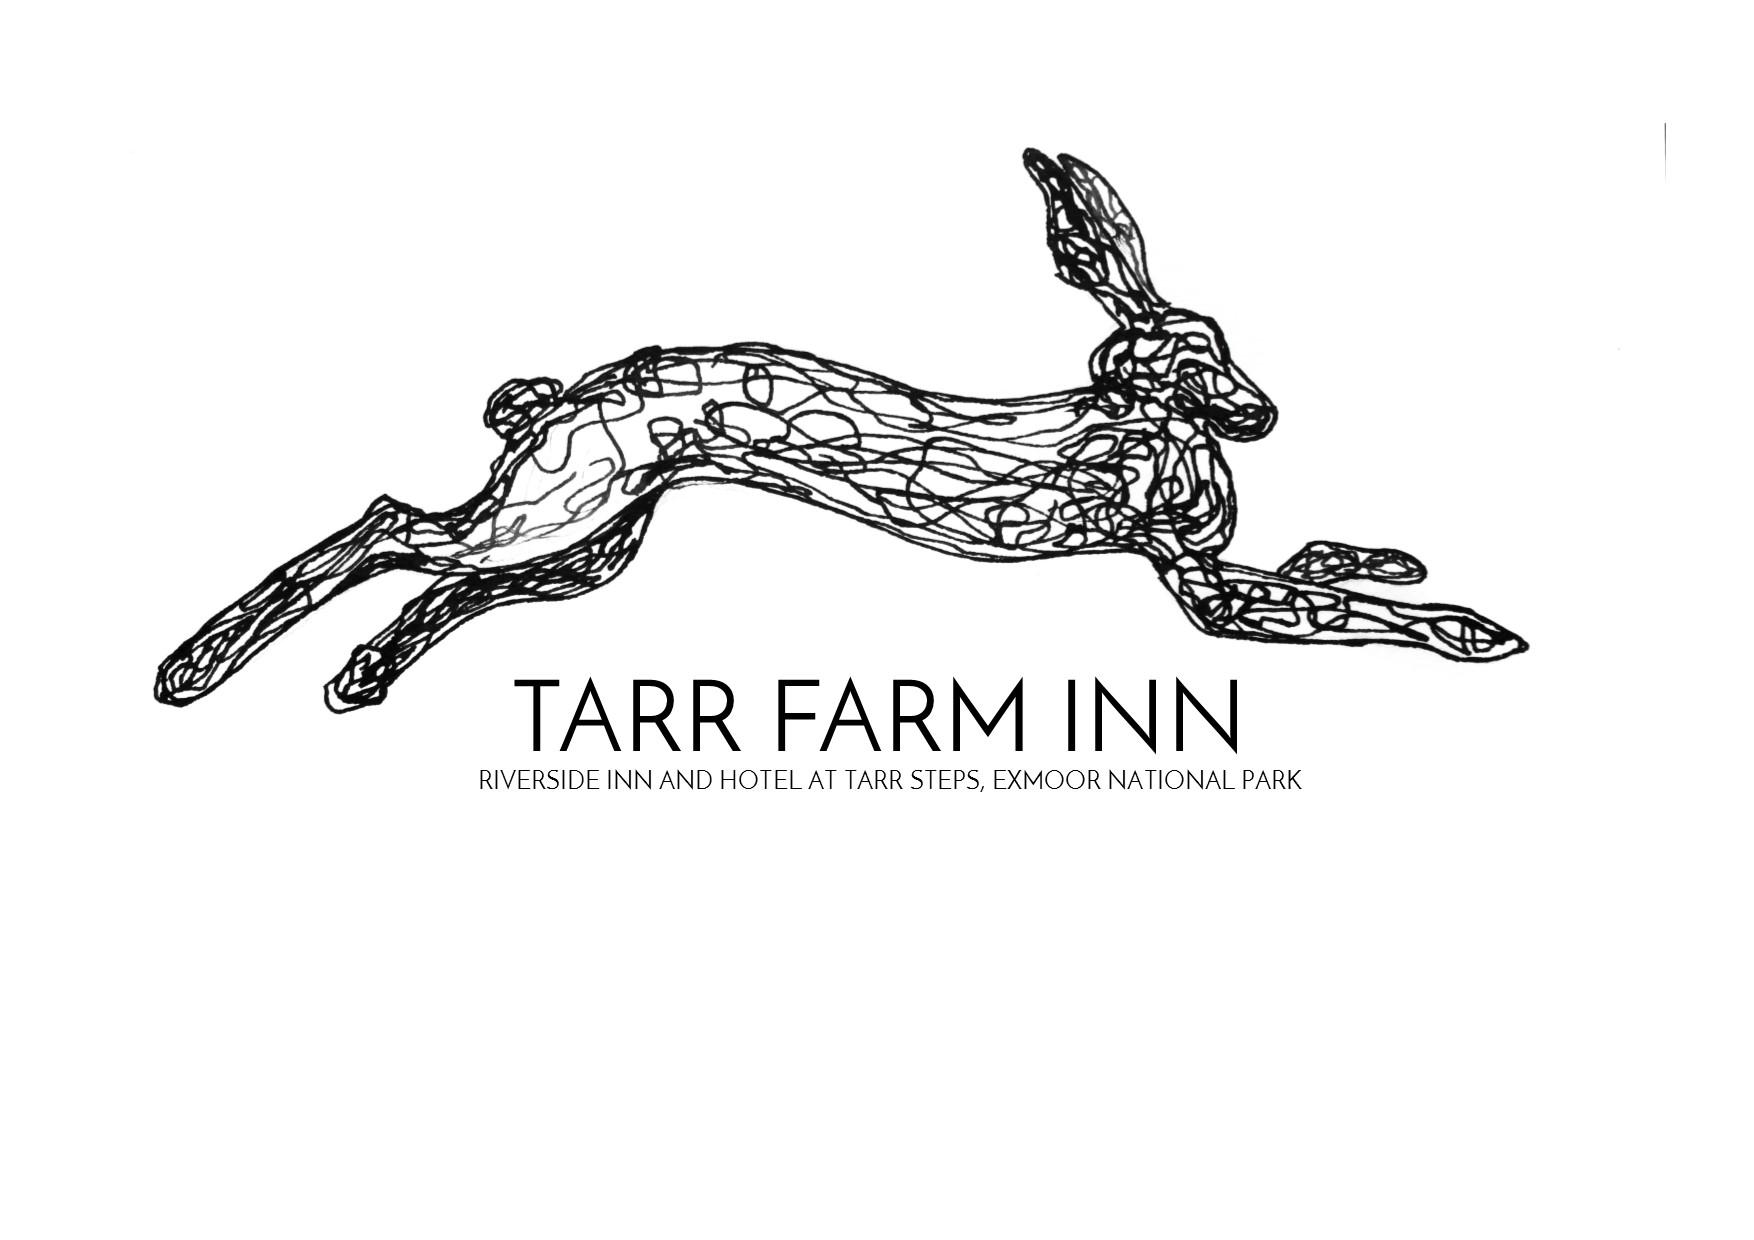 Tarr Farm Inn